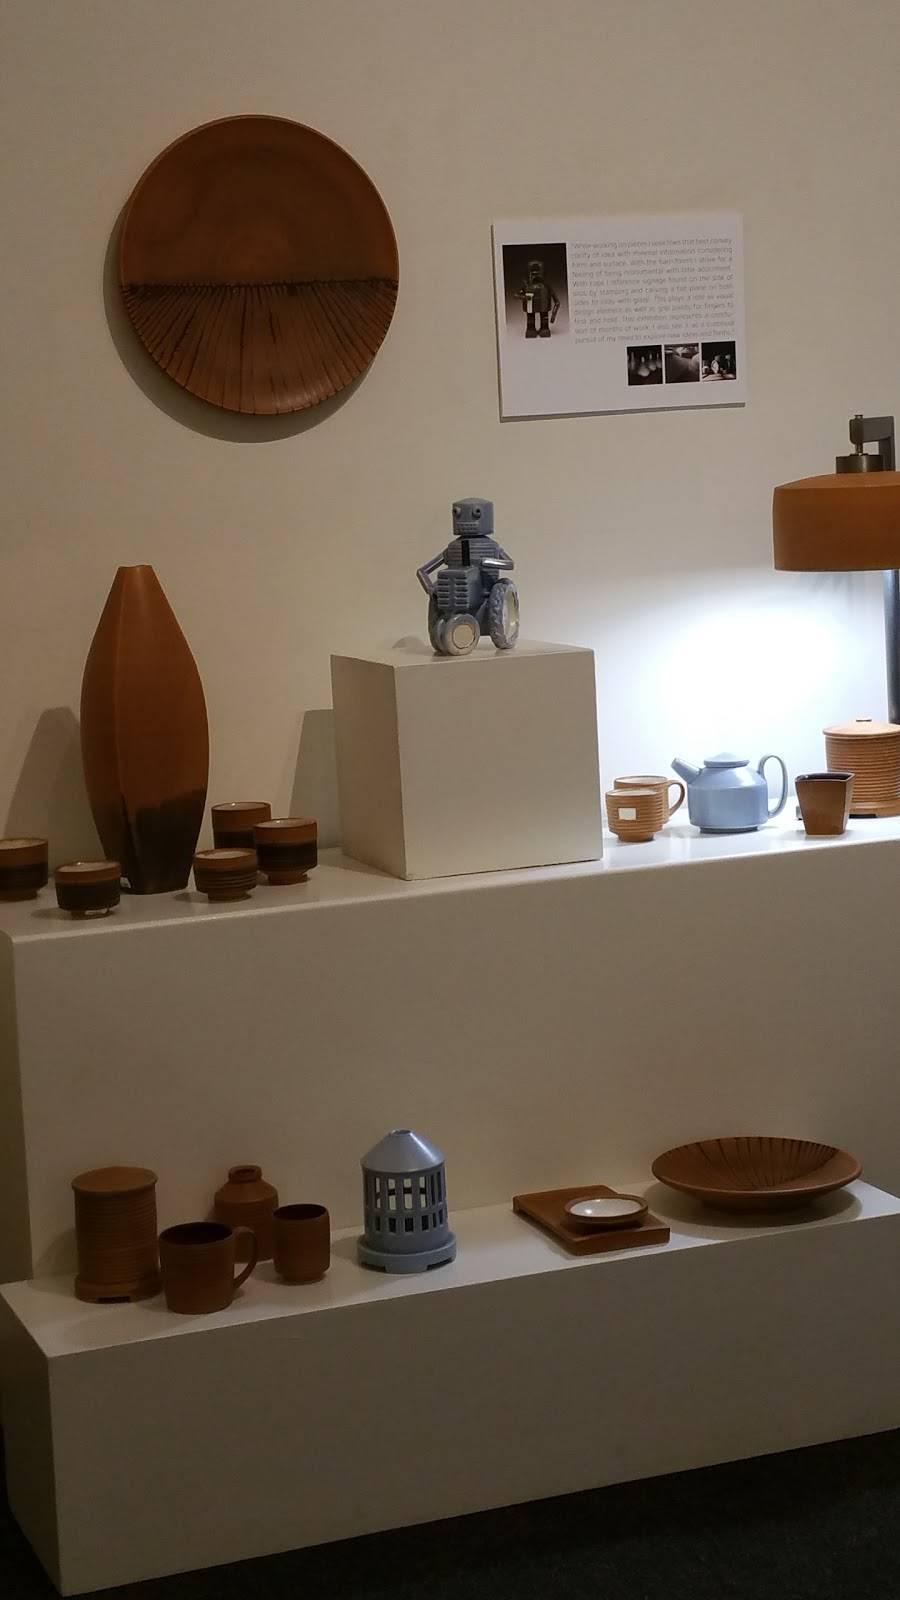 Grand Hand Gallery - art gallery  | Photo 8 of 10 | Address: 619 Grand Ave, St Paul, MN 55102, USA | Phone: (651) 312-1122